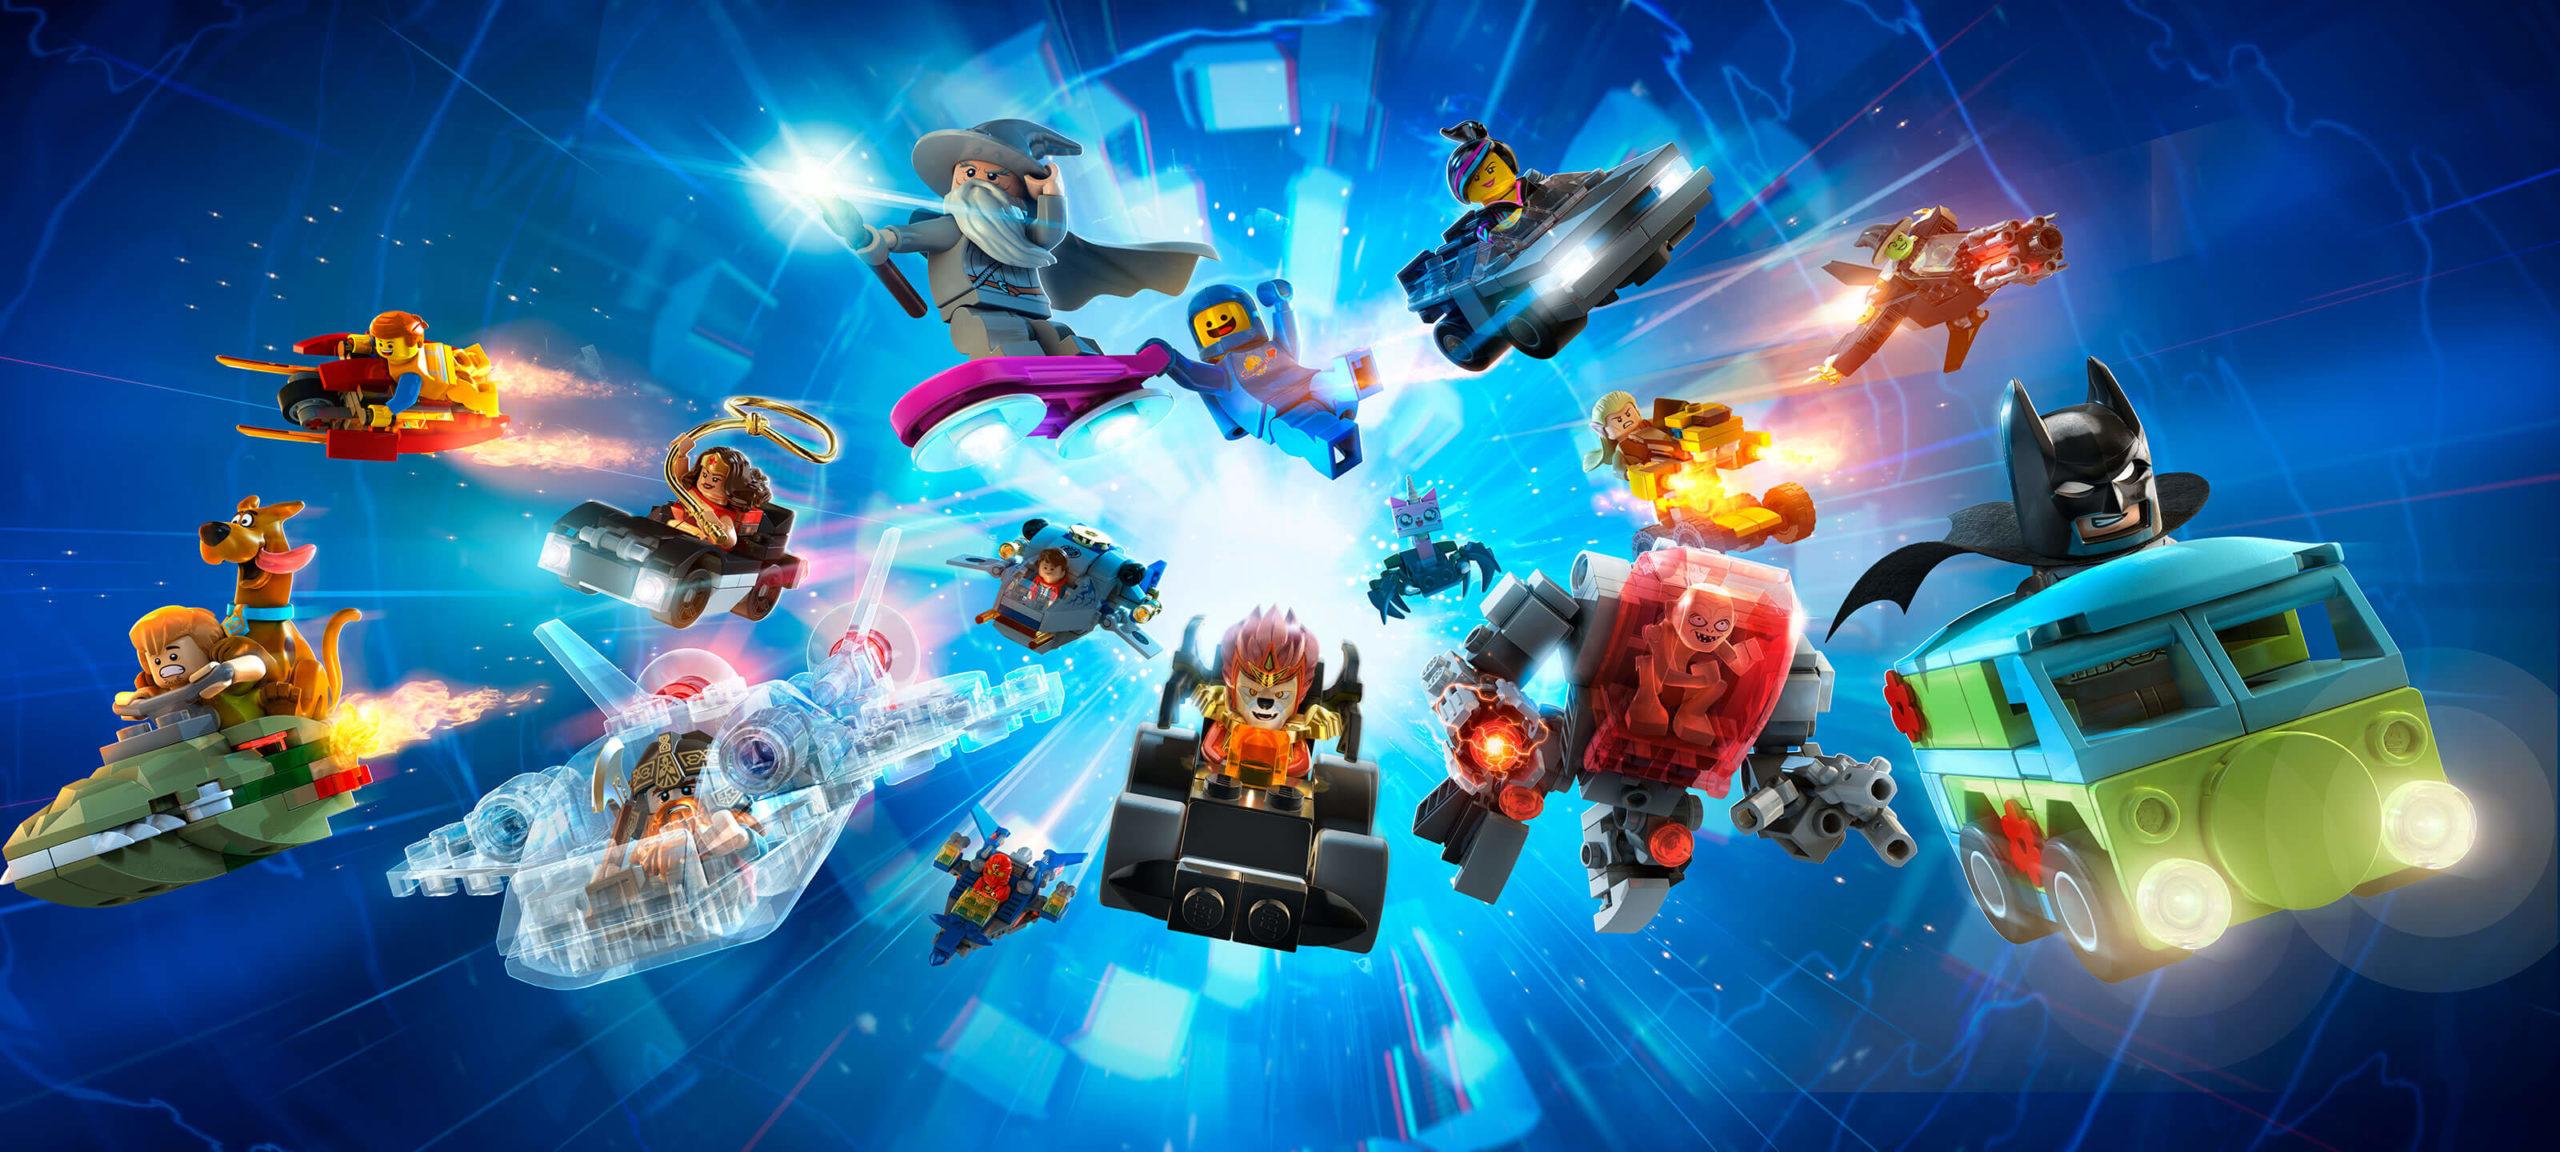 LEGO Dimensions - Header Image